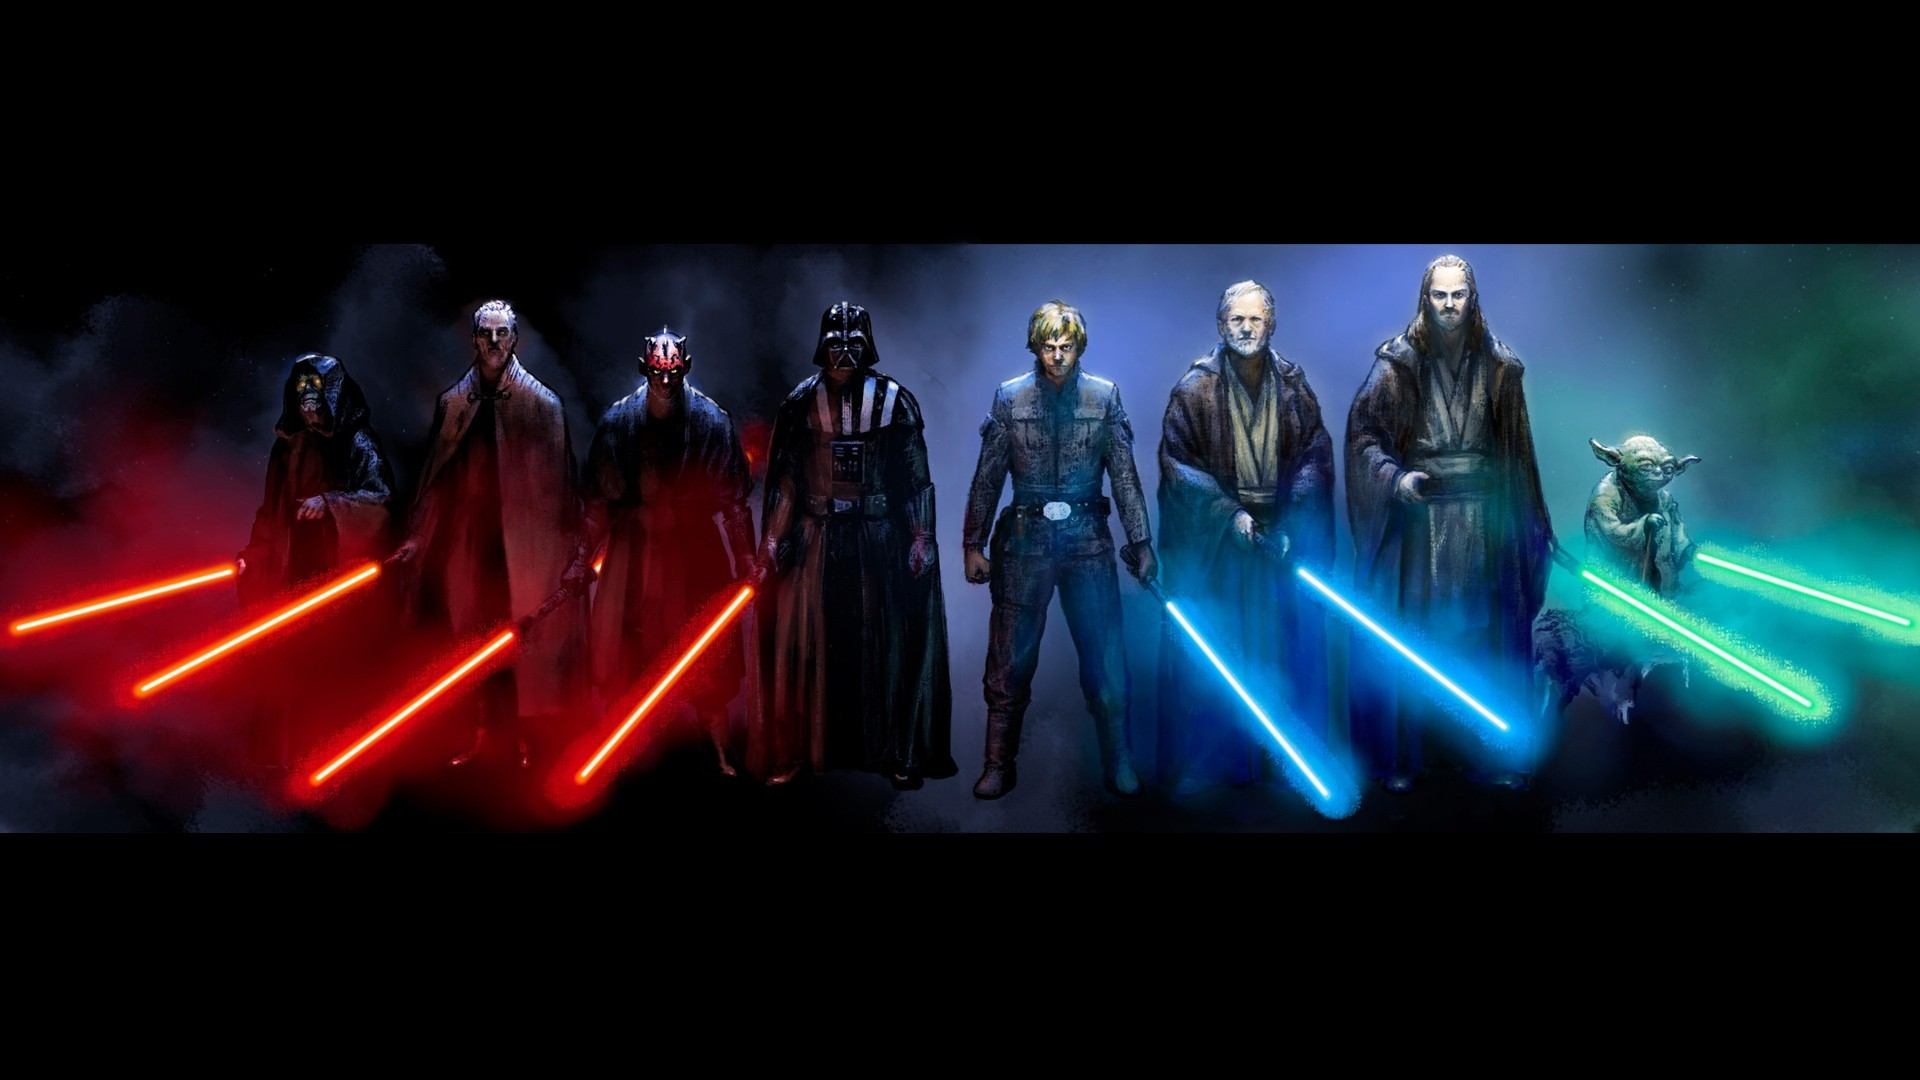 General 1920x1080 Star Wars Luke Skywalker Darth Vader Darth Maul Obi-Wan Kenobi Yoda lightsaber Jedi Sith artwork Qui-Gon Jinn Emperor Palpatine Count Dooku